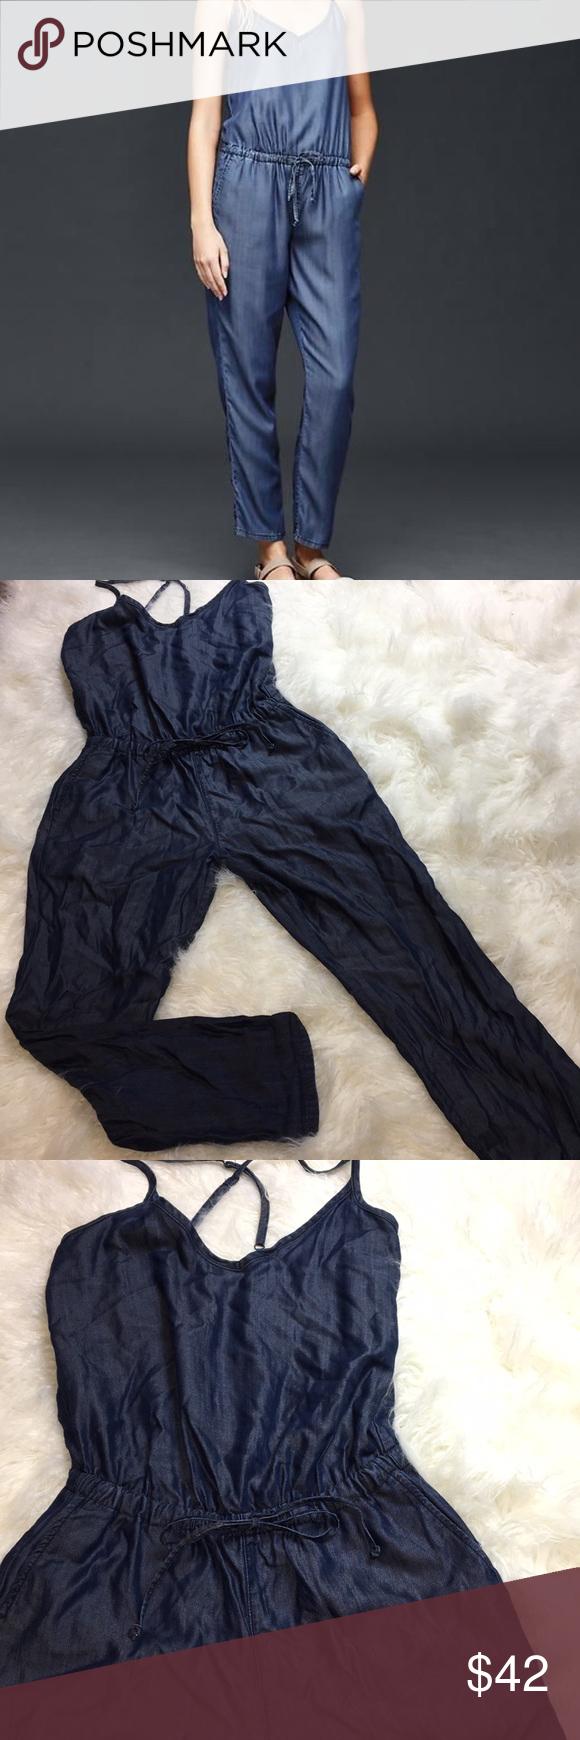 08057927c2d Gap 1969 woman s tencel denim cami jumpsuit Gap 1969 Tencel Denim cami  jumpsuit Size x-